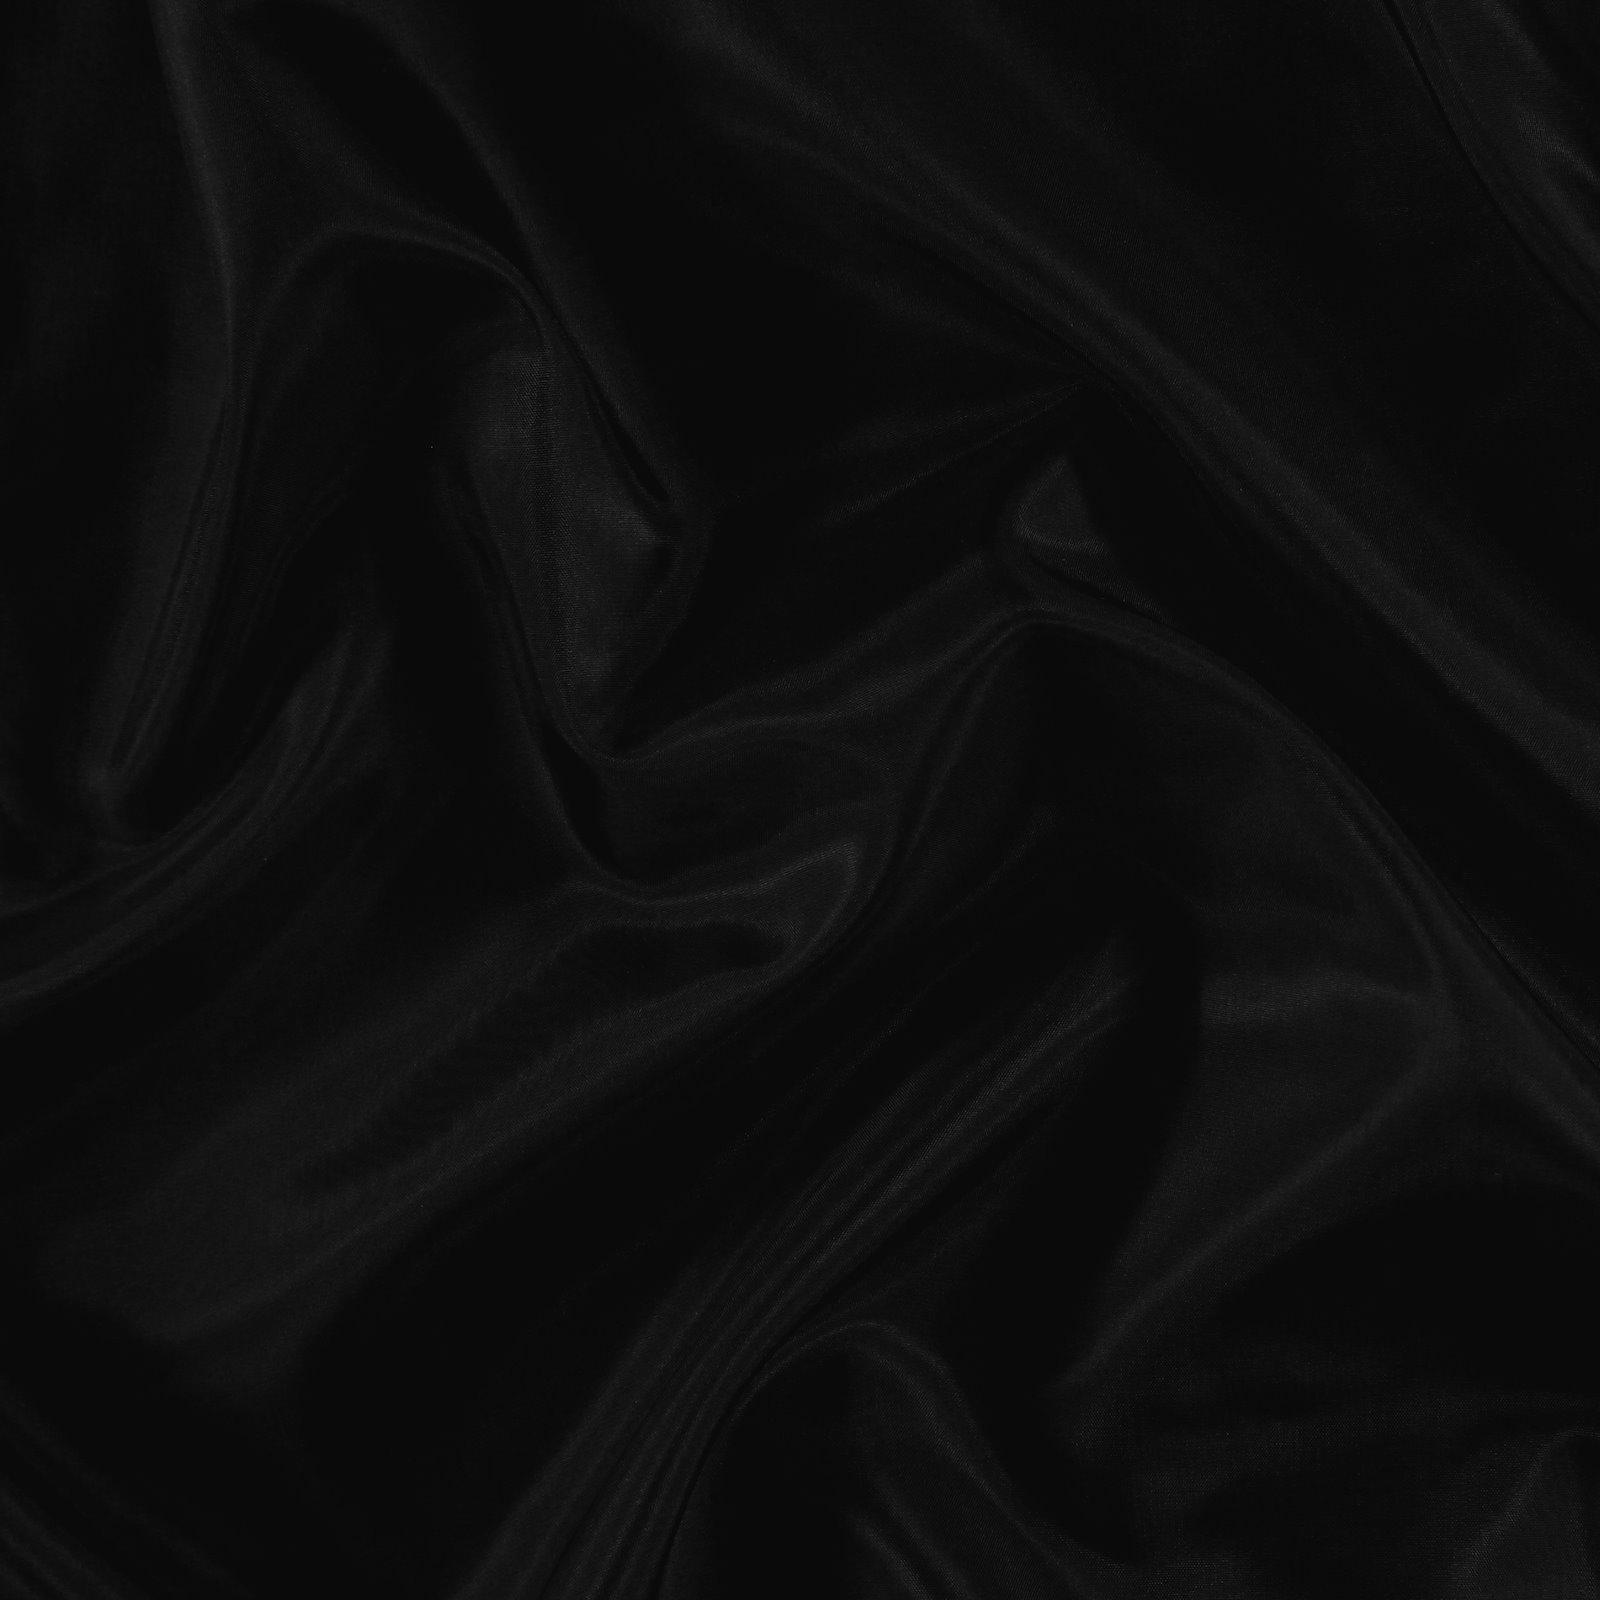 Acetate lining black